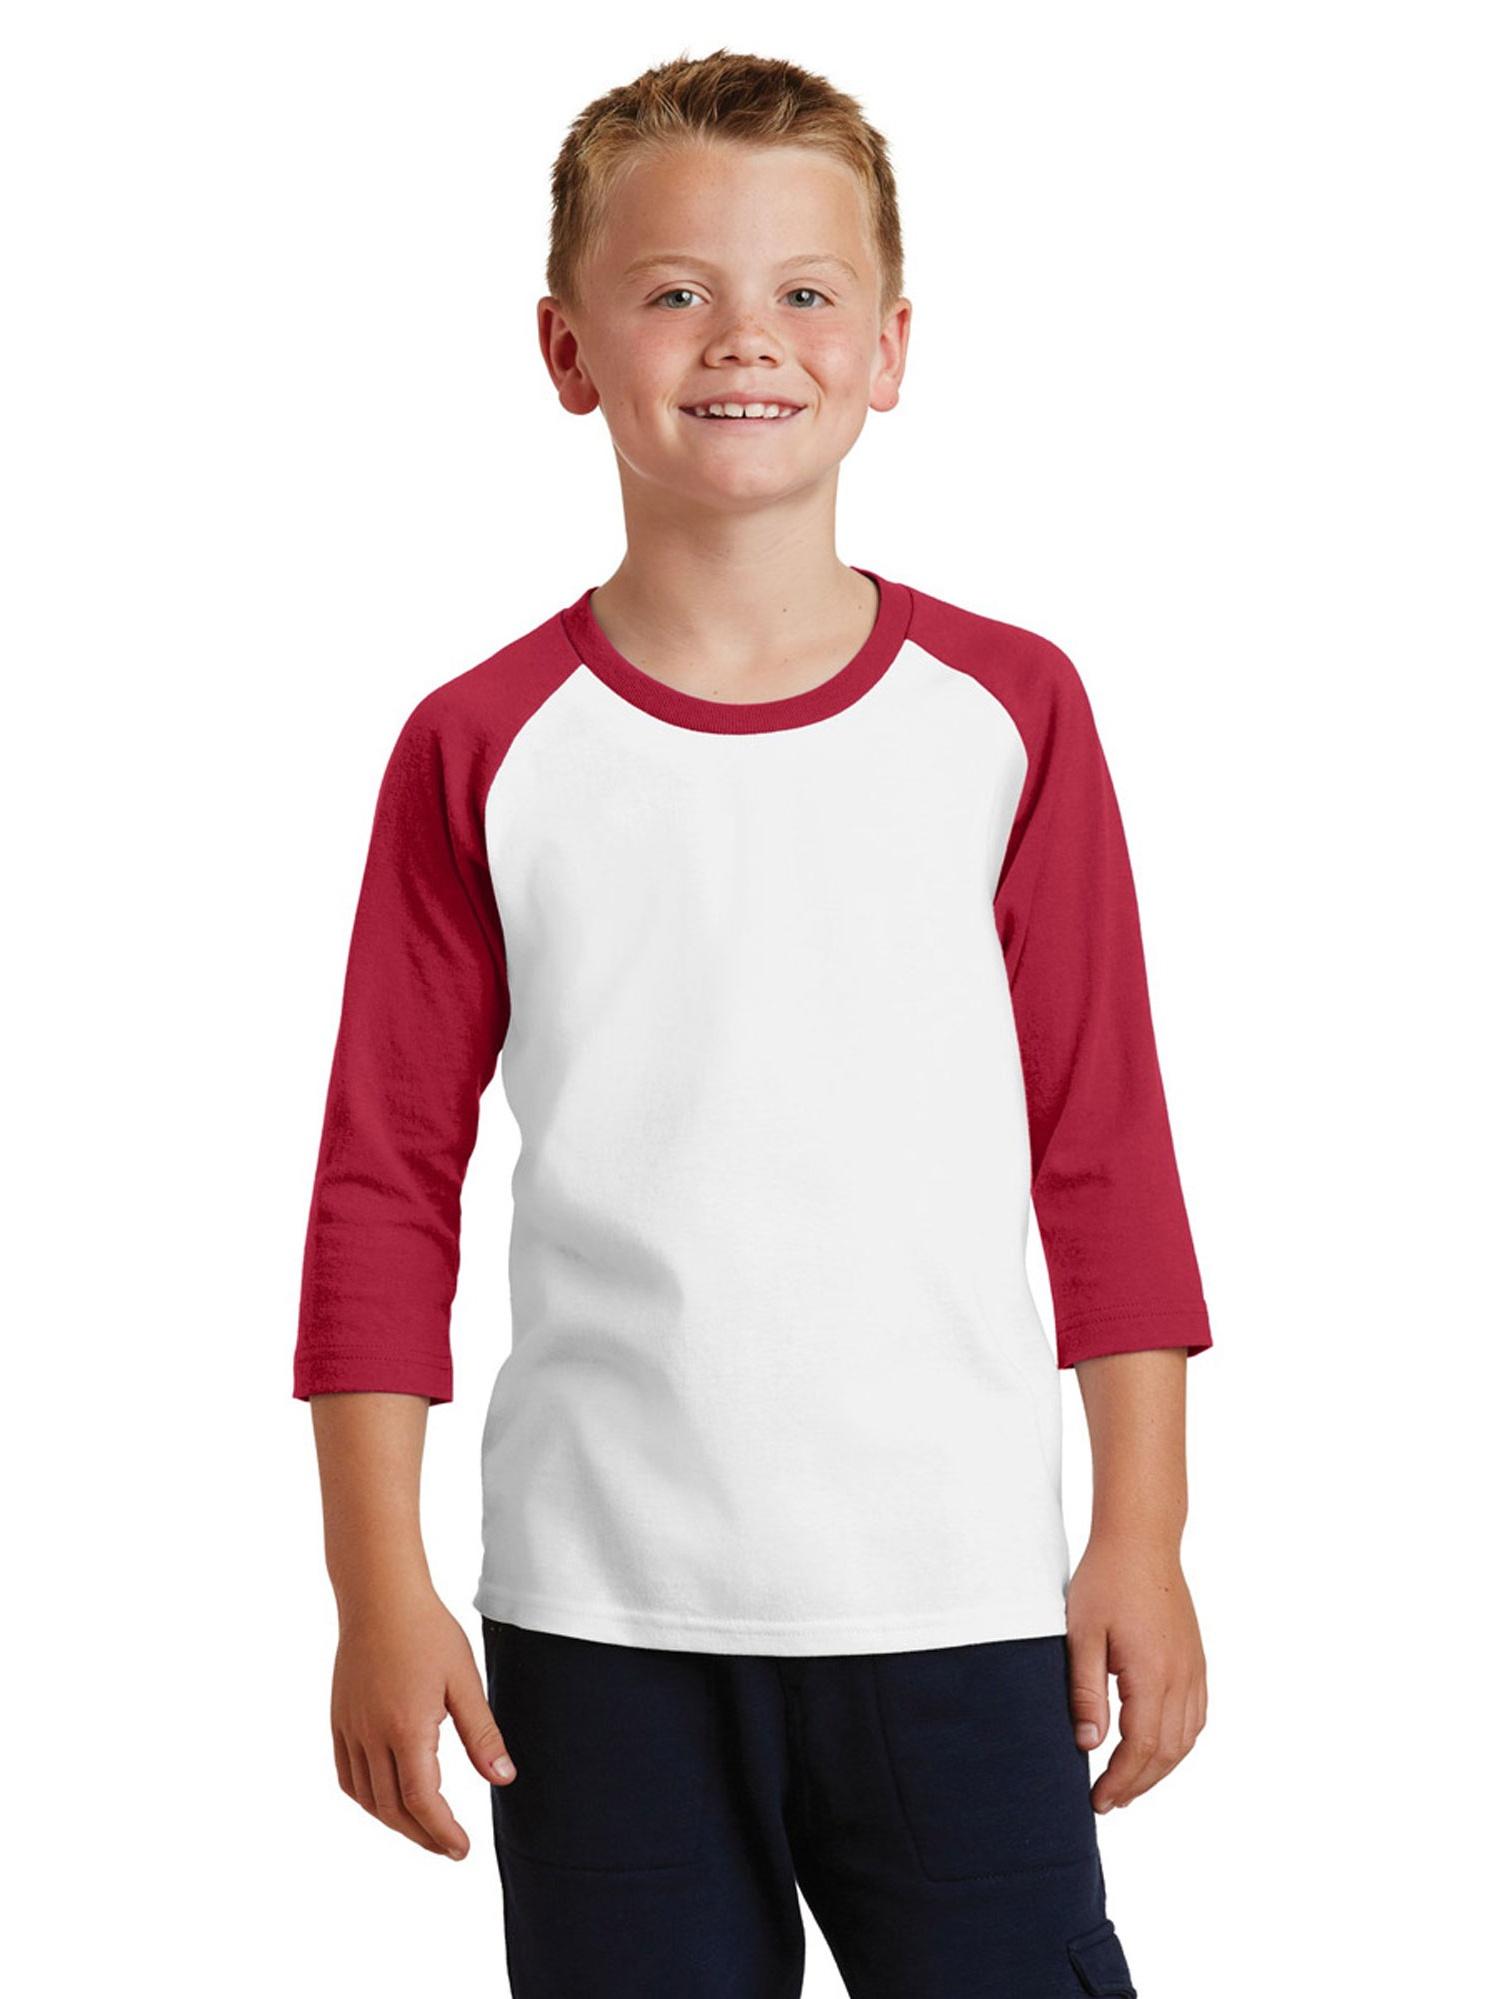 Port & Company® Youth 3/4-Sleeve Raglan T-Shirt